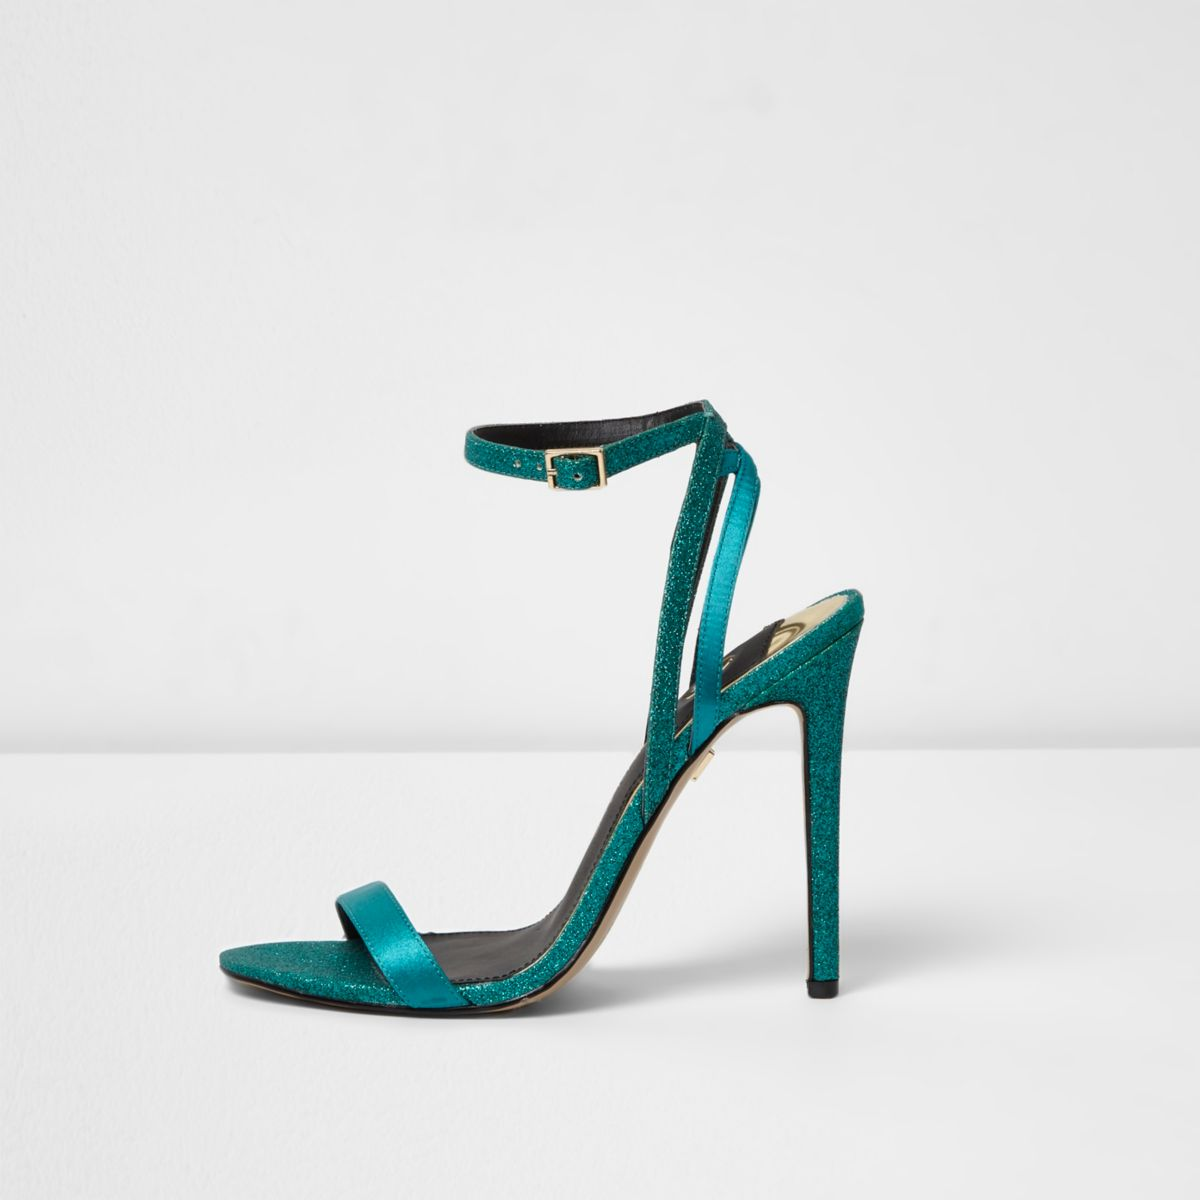 Barely There – Blaue, glitzernde Sandalen